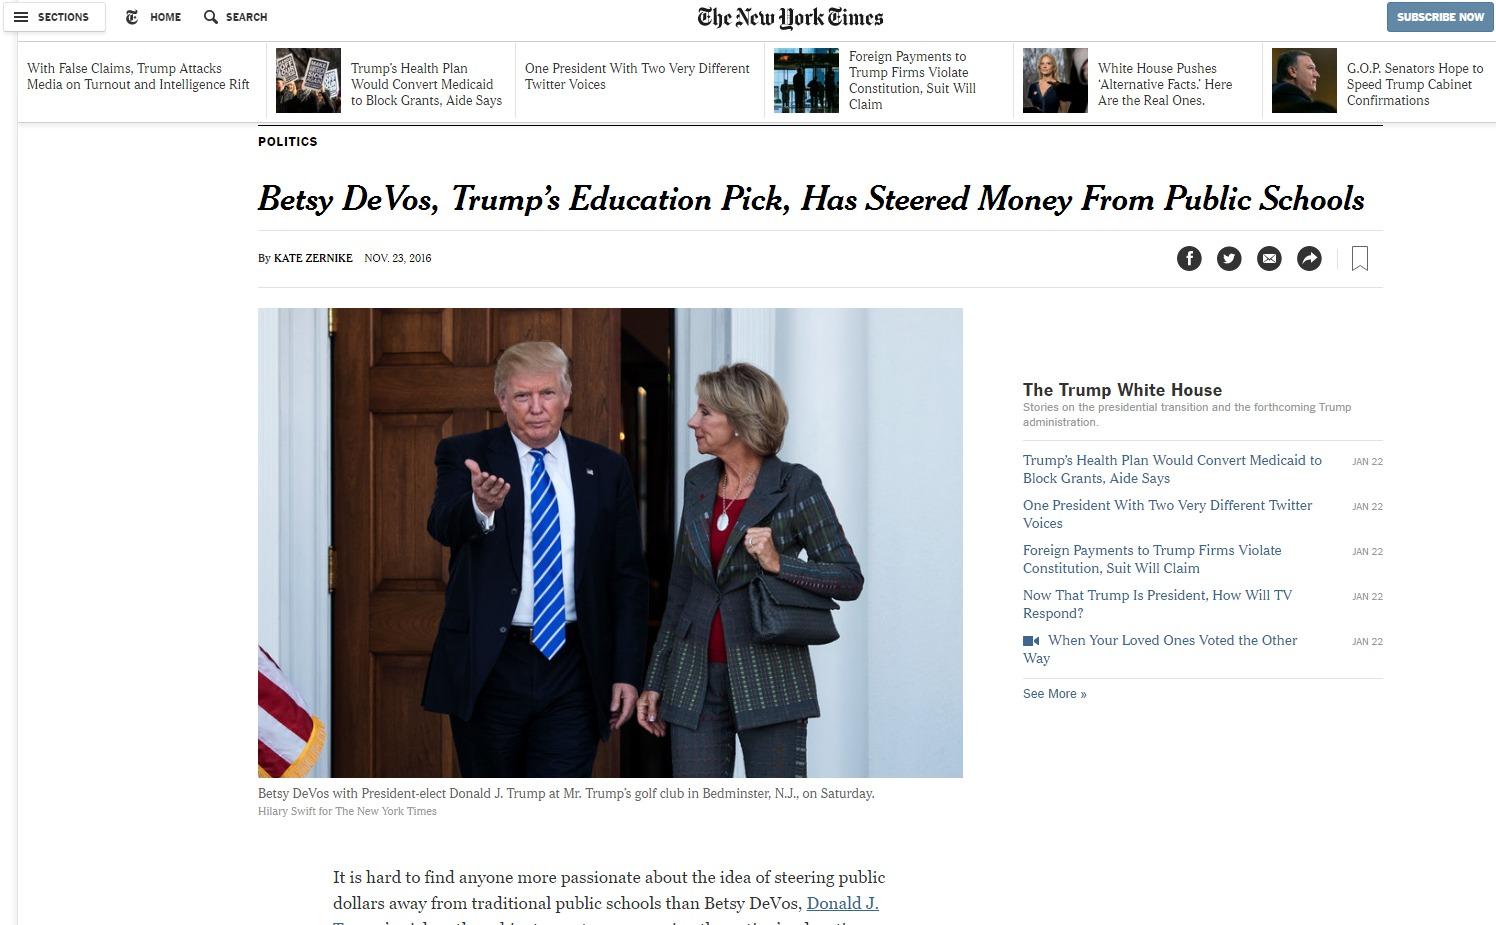 Betsy Devos Trumps Education Pick Has >> Betsy Devos Trump S Education Pick Has Steered Money From Public